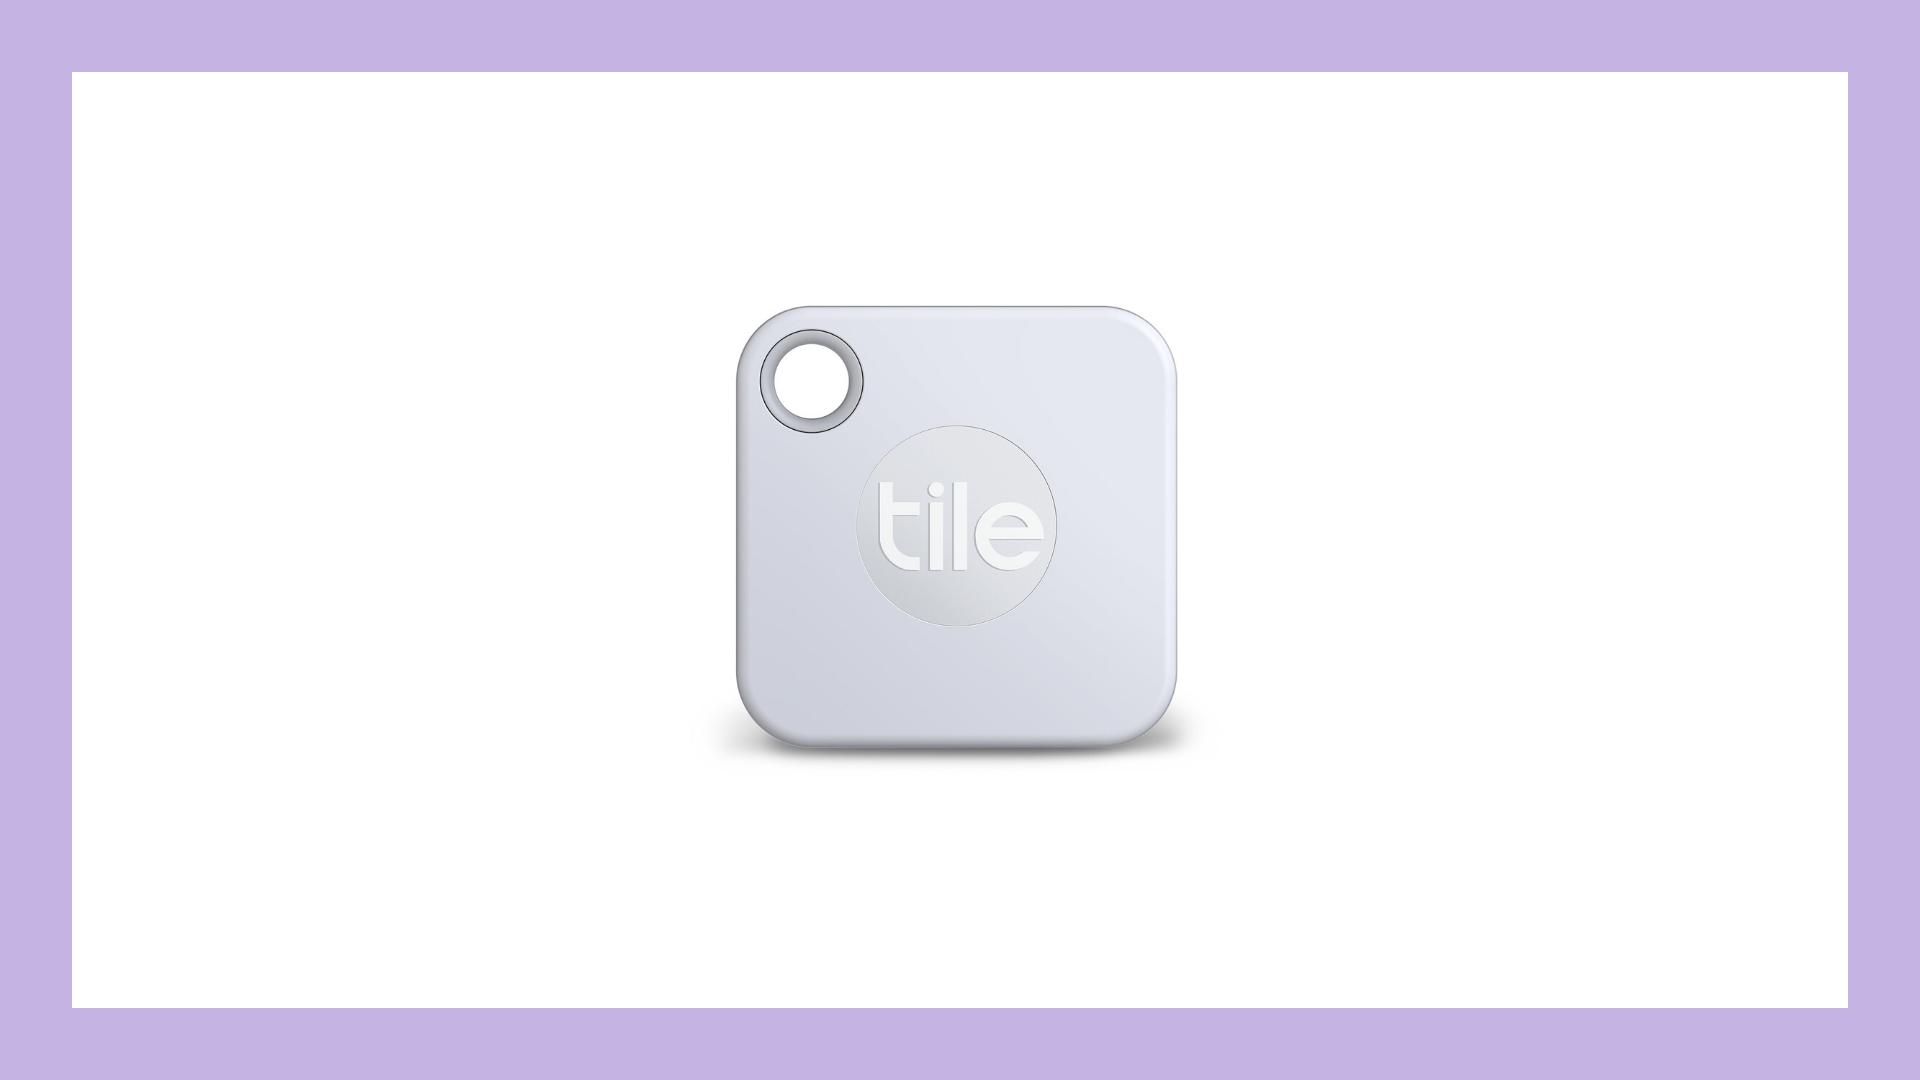 tile tech gifts for women christmas